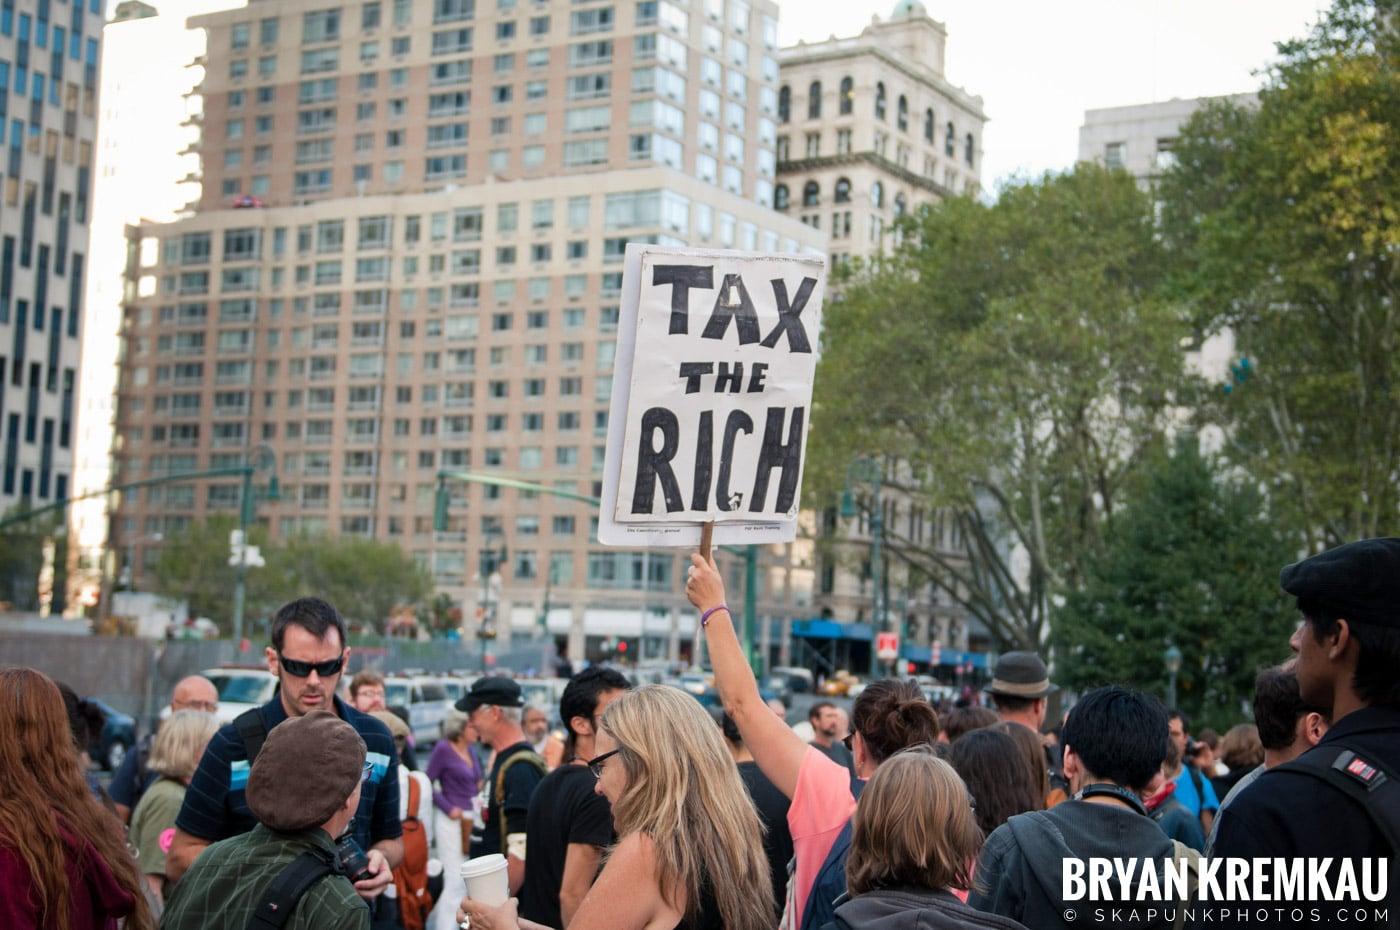 Tom Morello @ Occupy Wall Street Anniversary Concert, Foley Square, NYC - 9.16.12 (4)